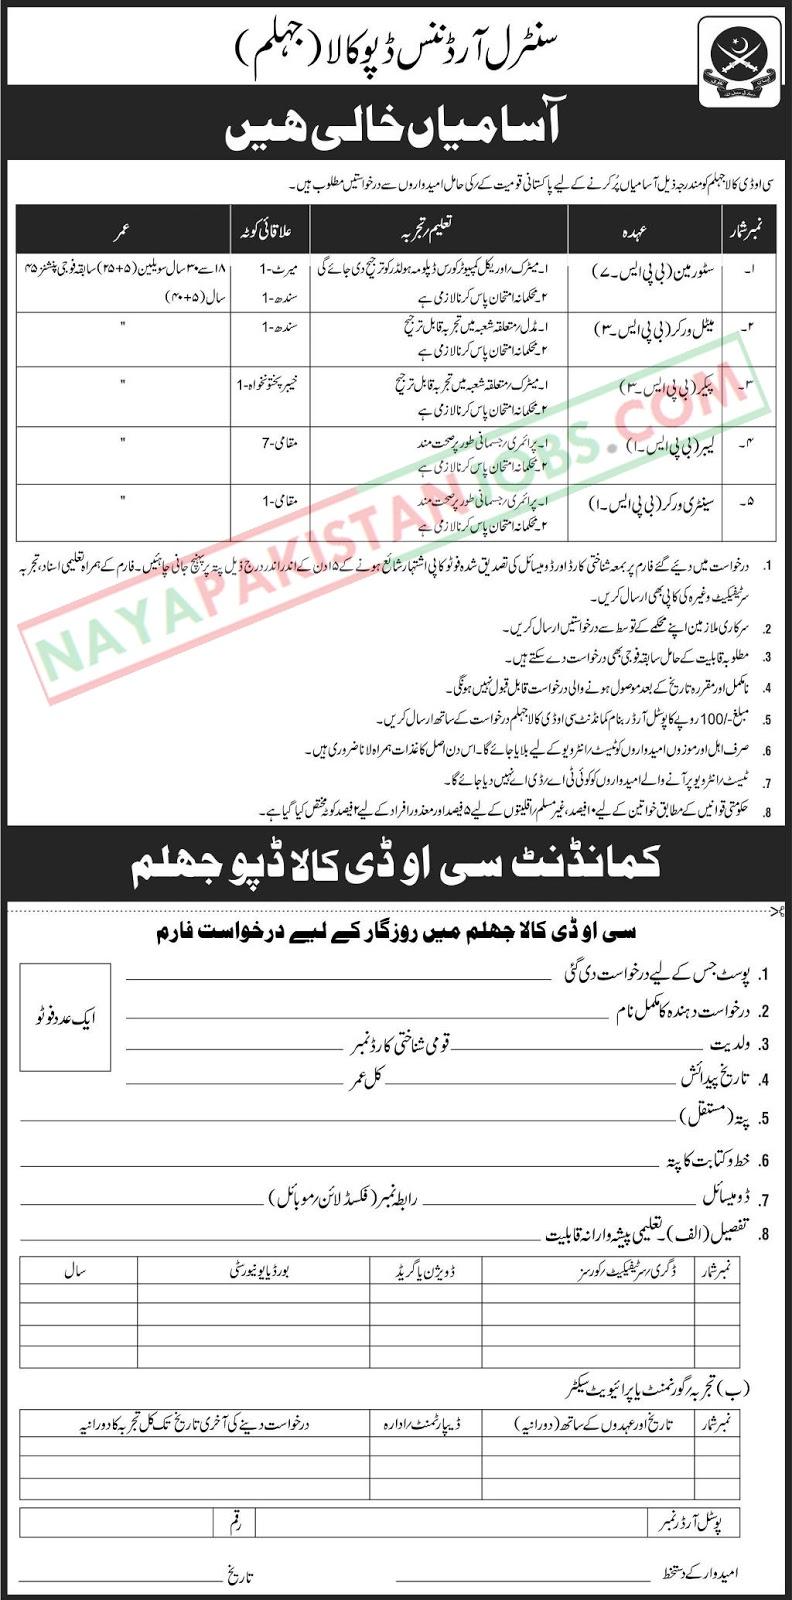 Latest Vacancies Announced in Pakistan Army at Central Depot Kala Jhelum 2 November 2018 - Naya Pakistan